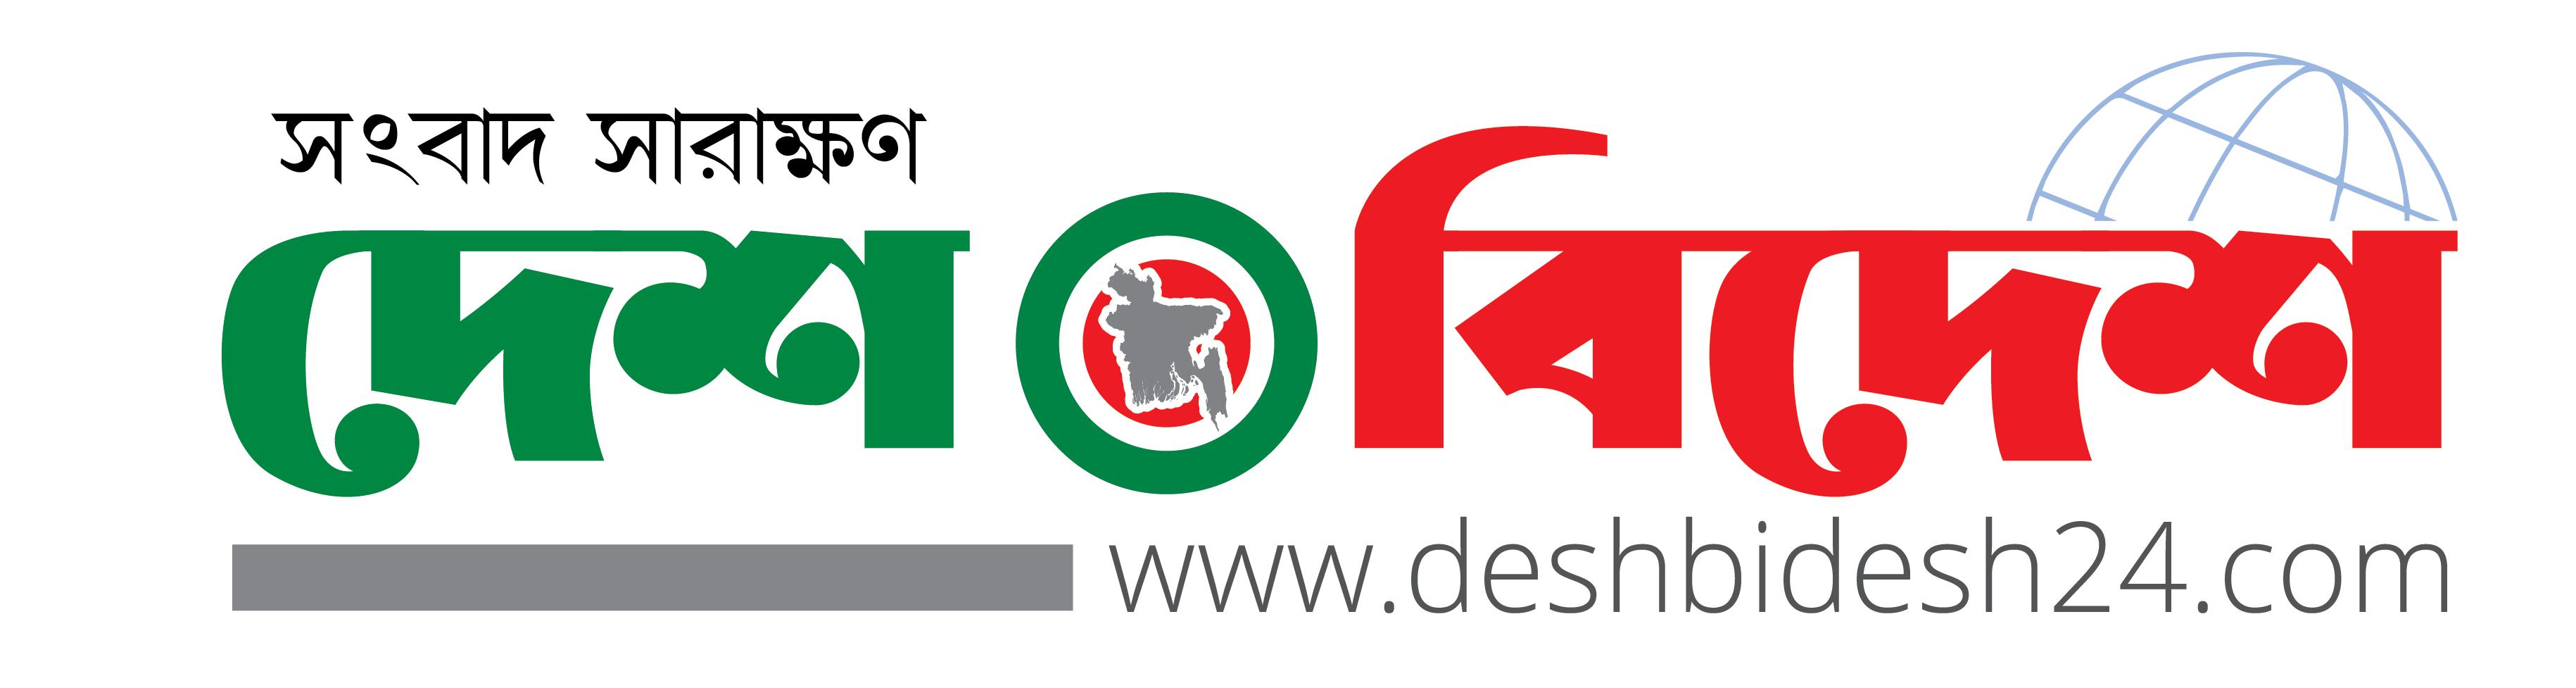 deshbidesh24.com